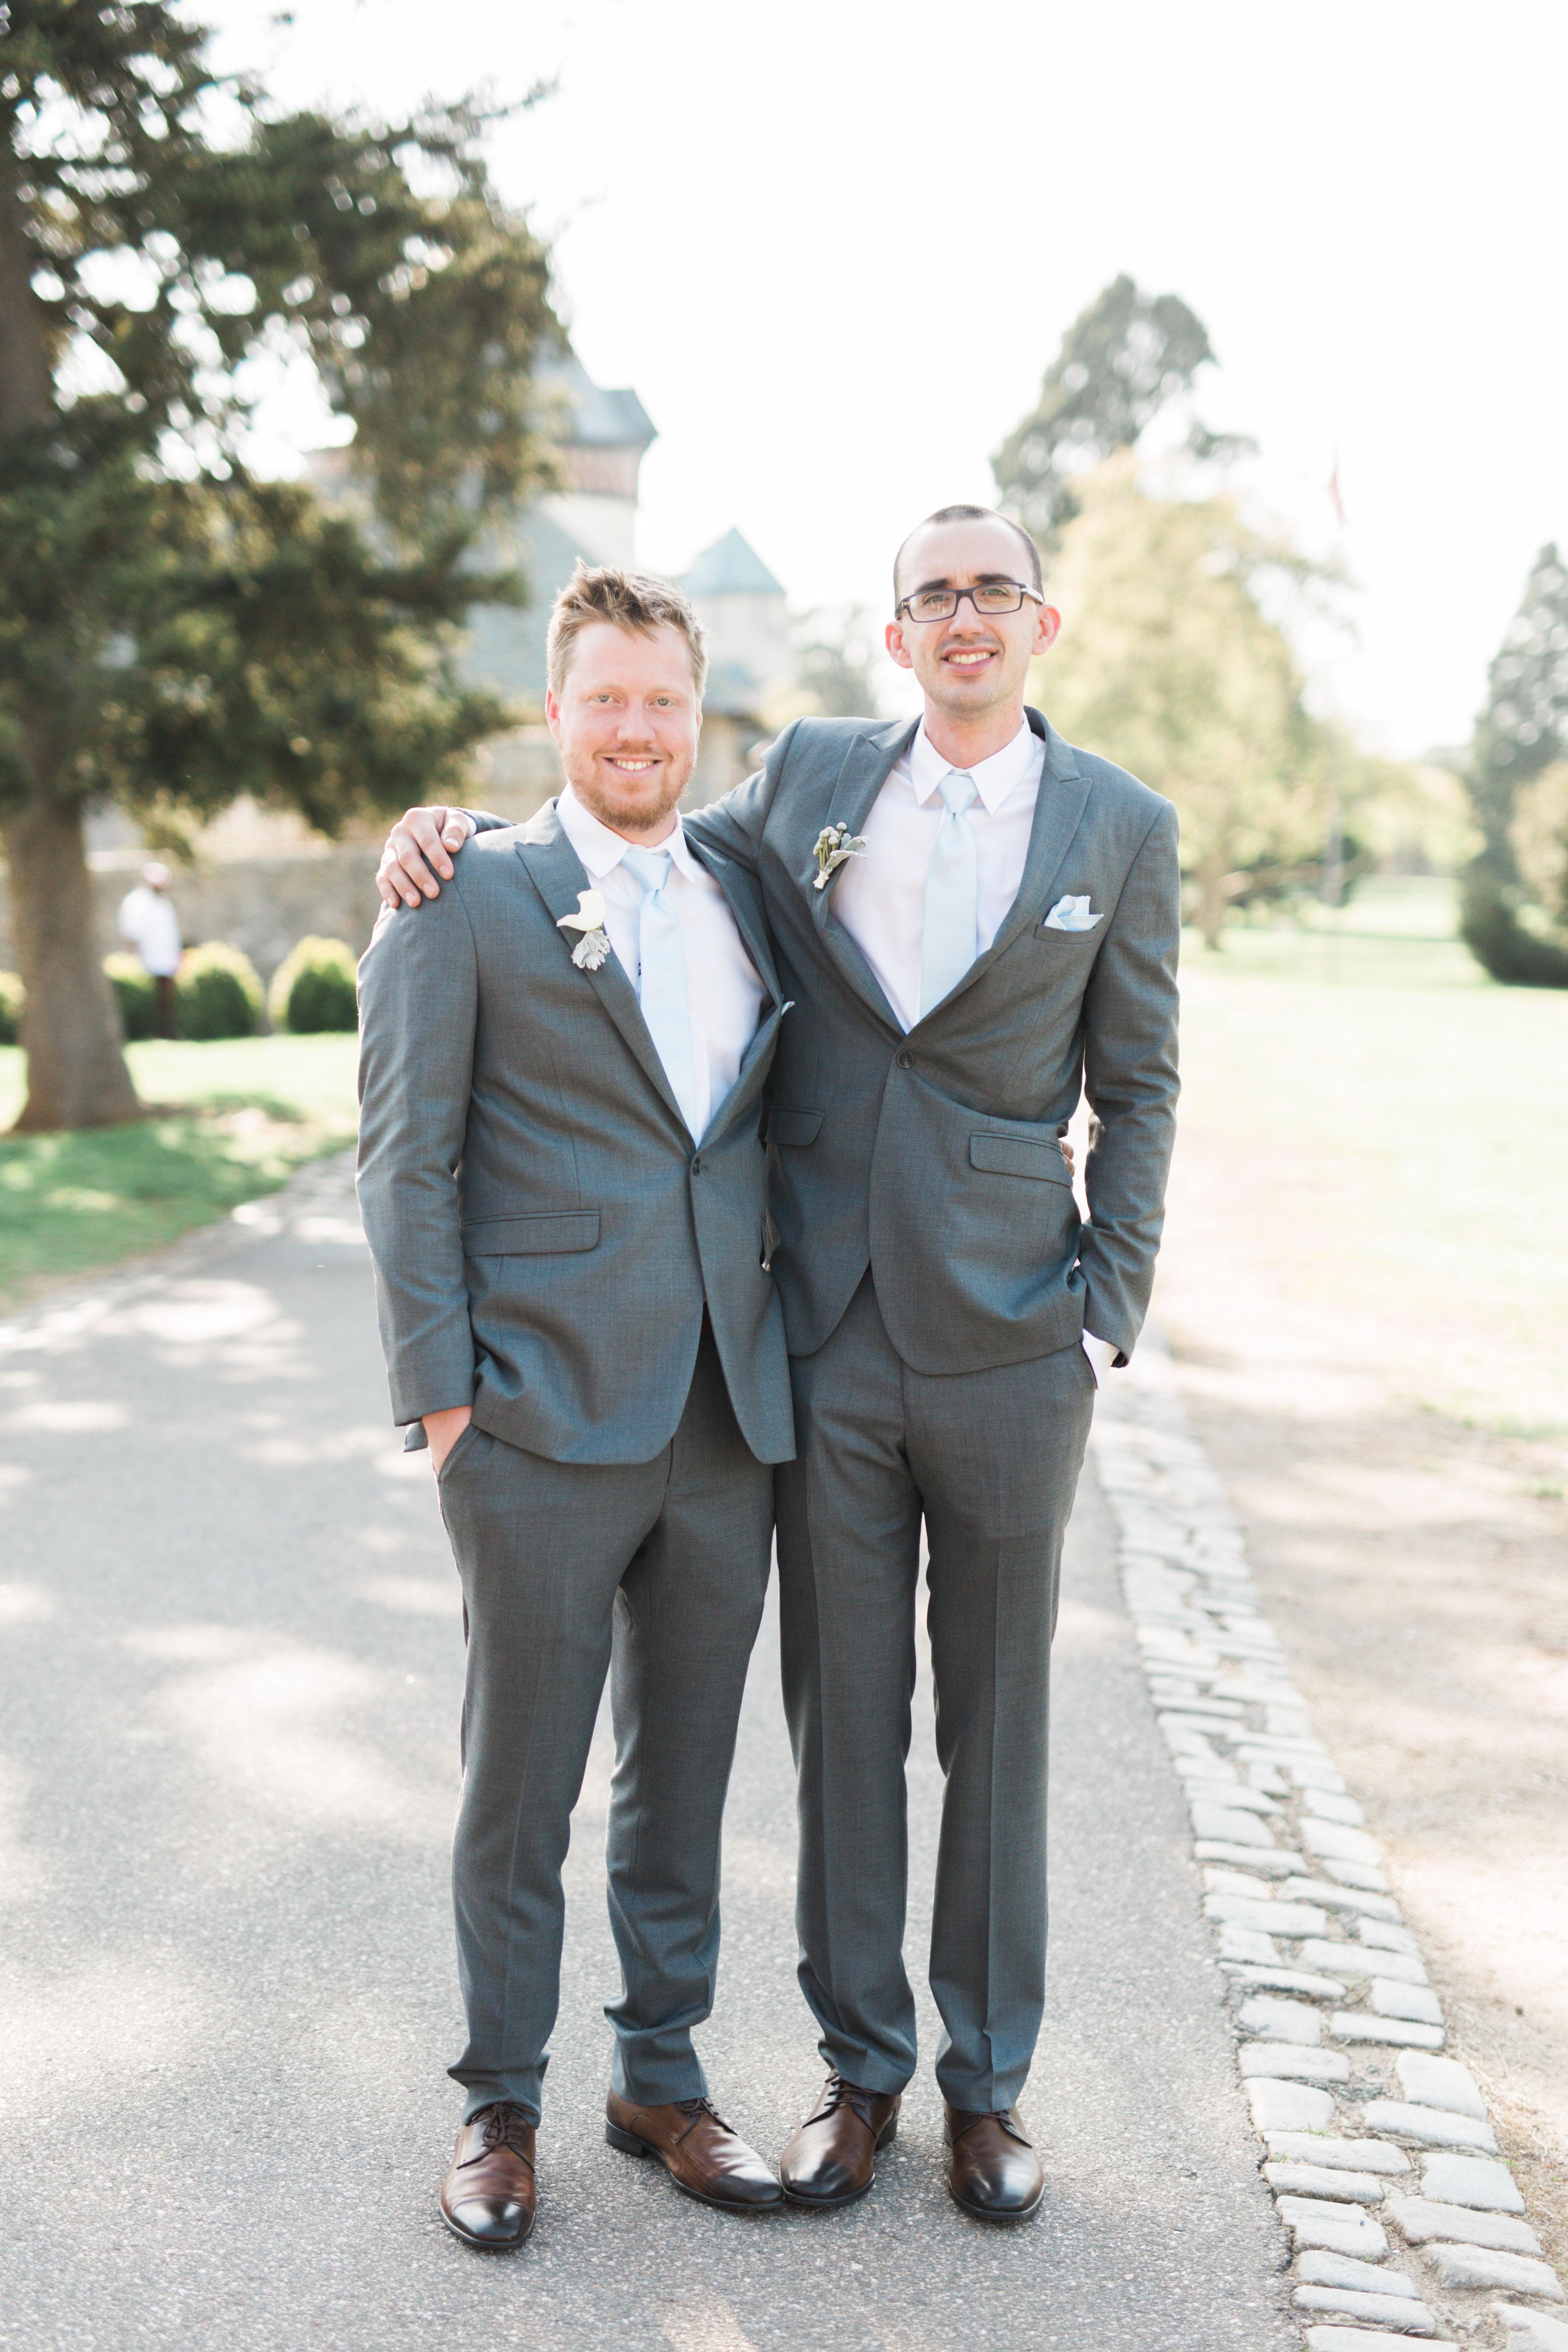 wedding groom groomsman pose outdoors